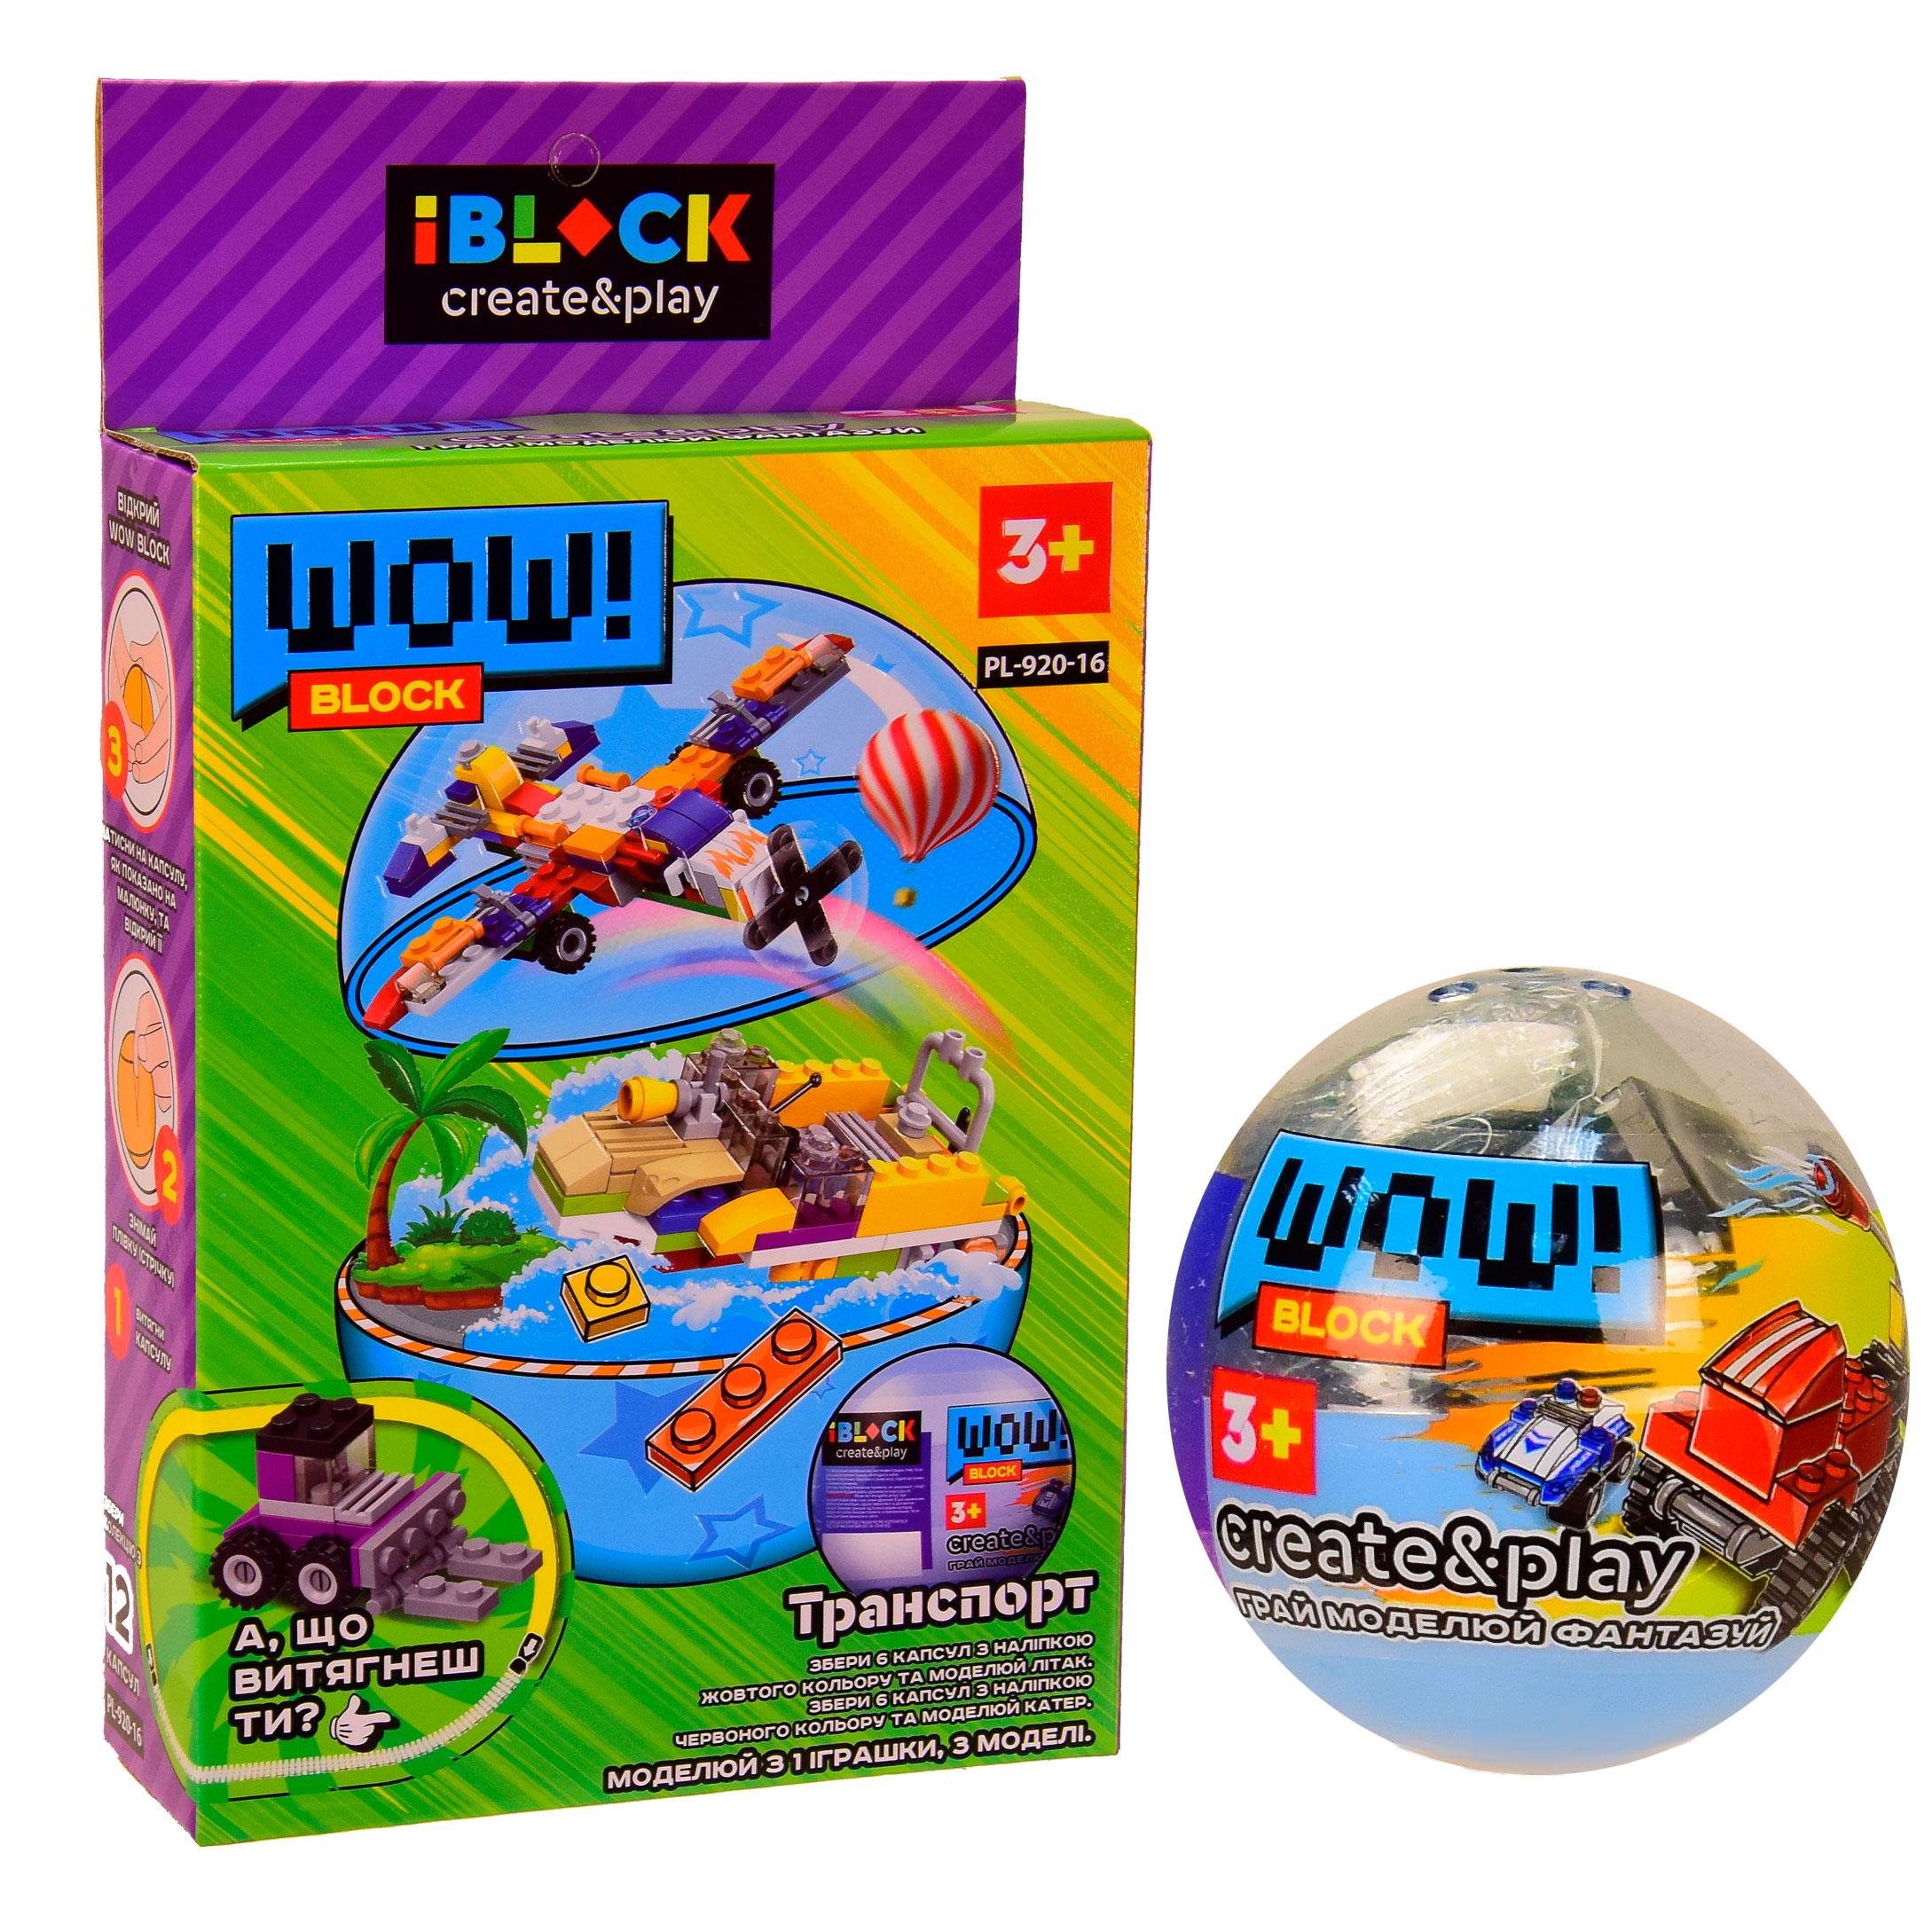 "Конструктор в кулі ""Wow block"" IBLOCK PL-920-16"